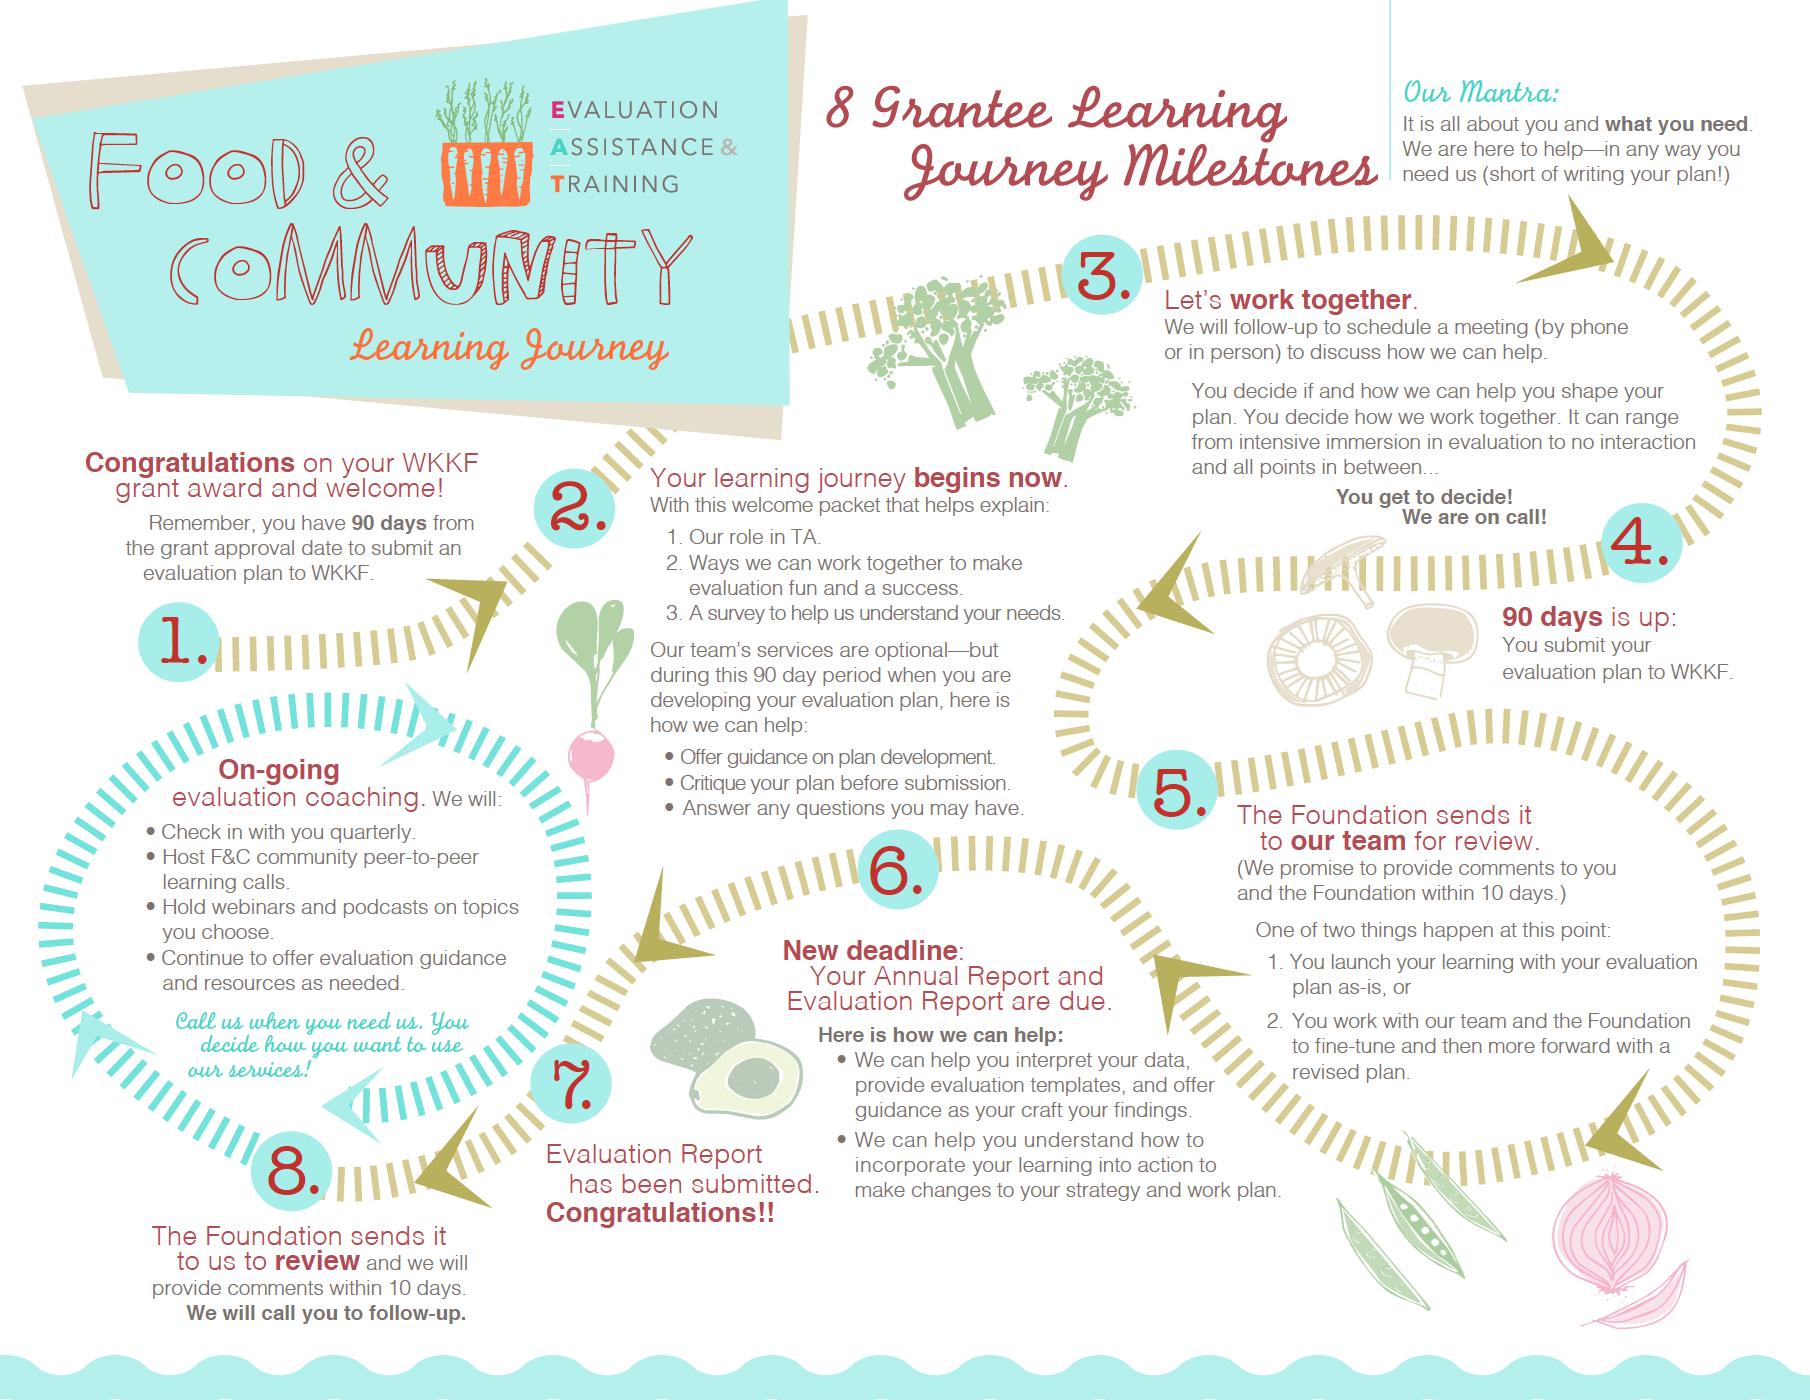 Food & Community Schematic